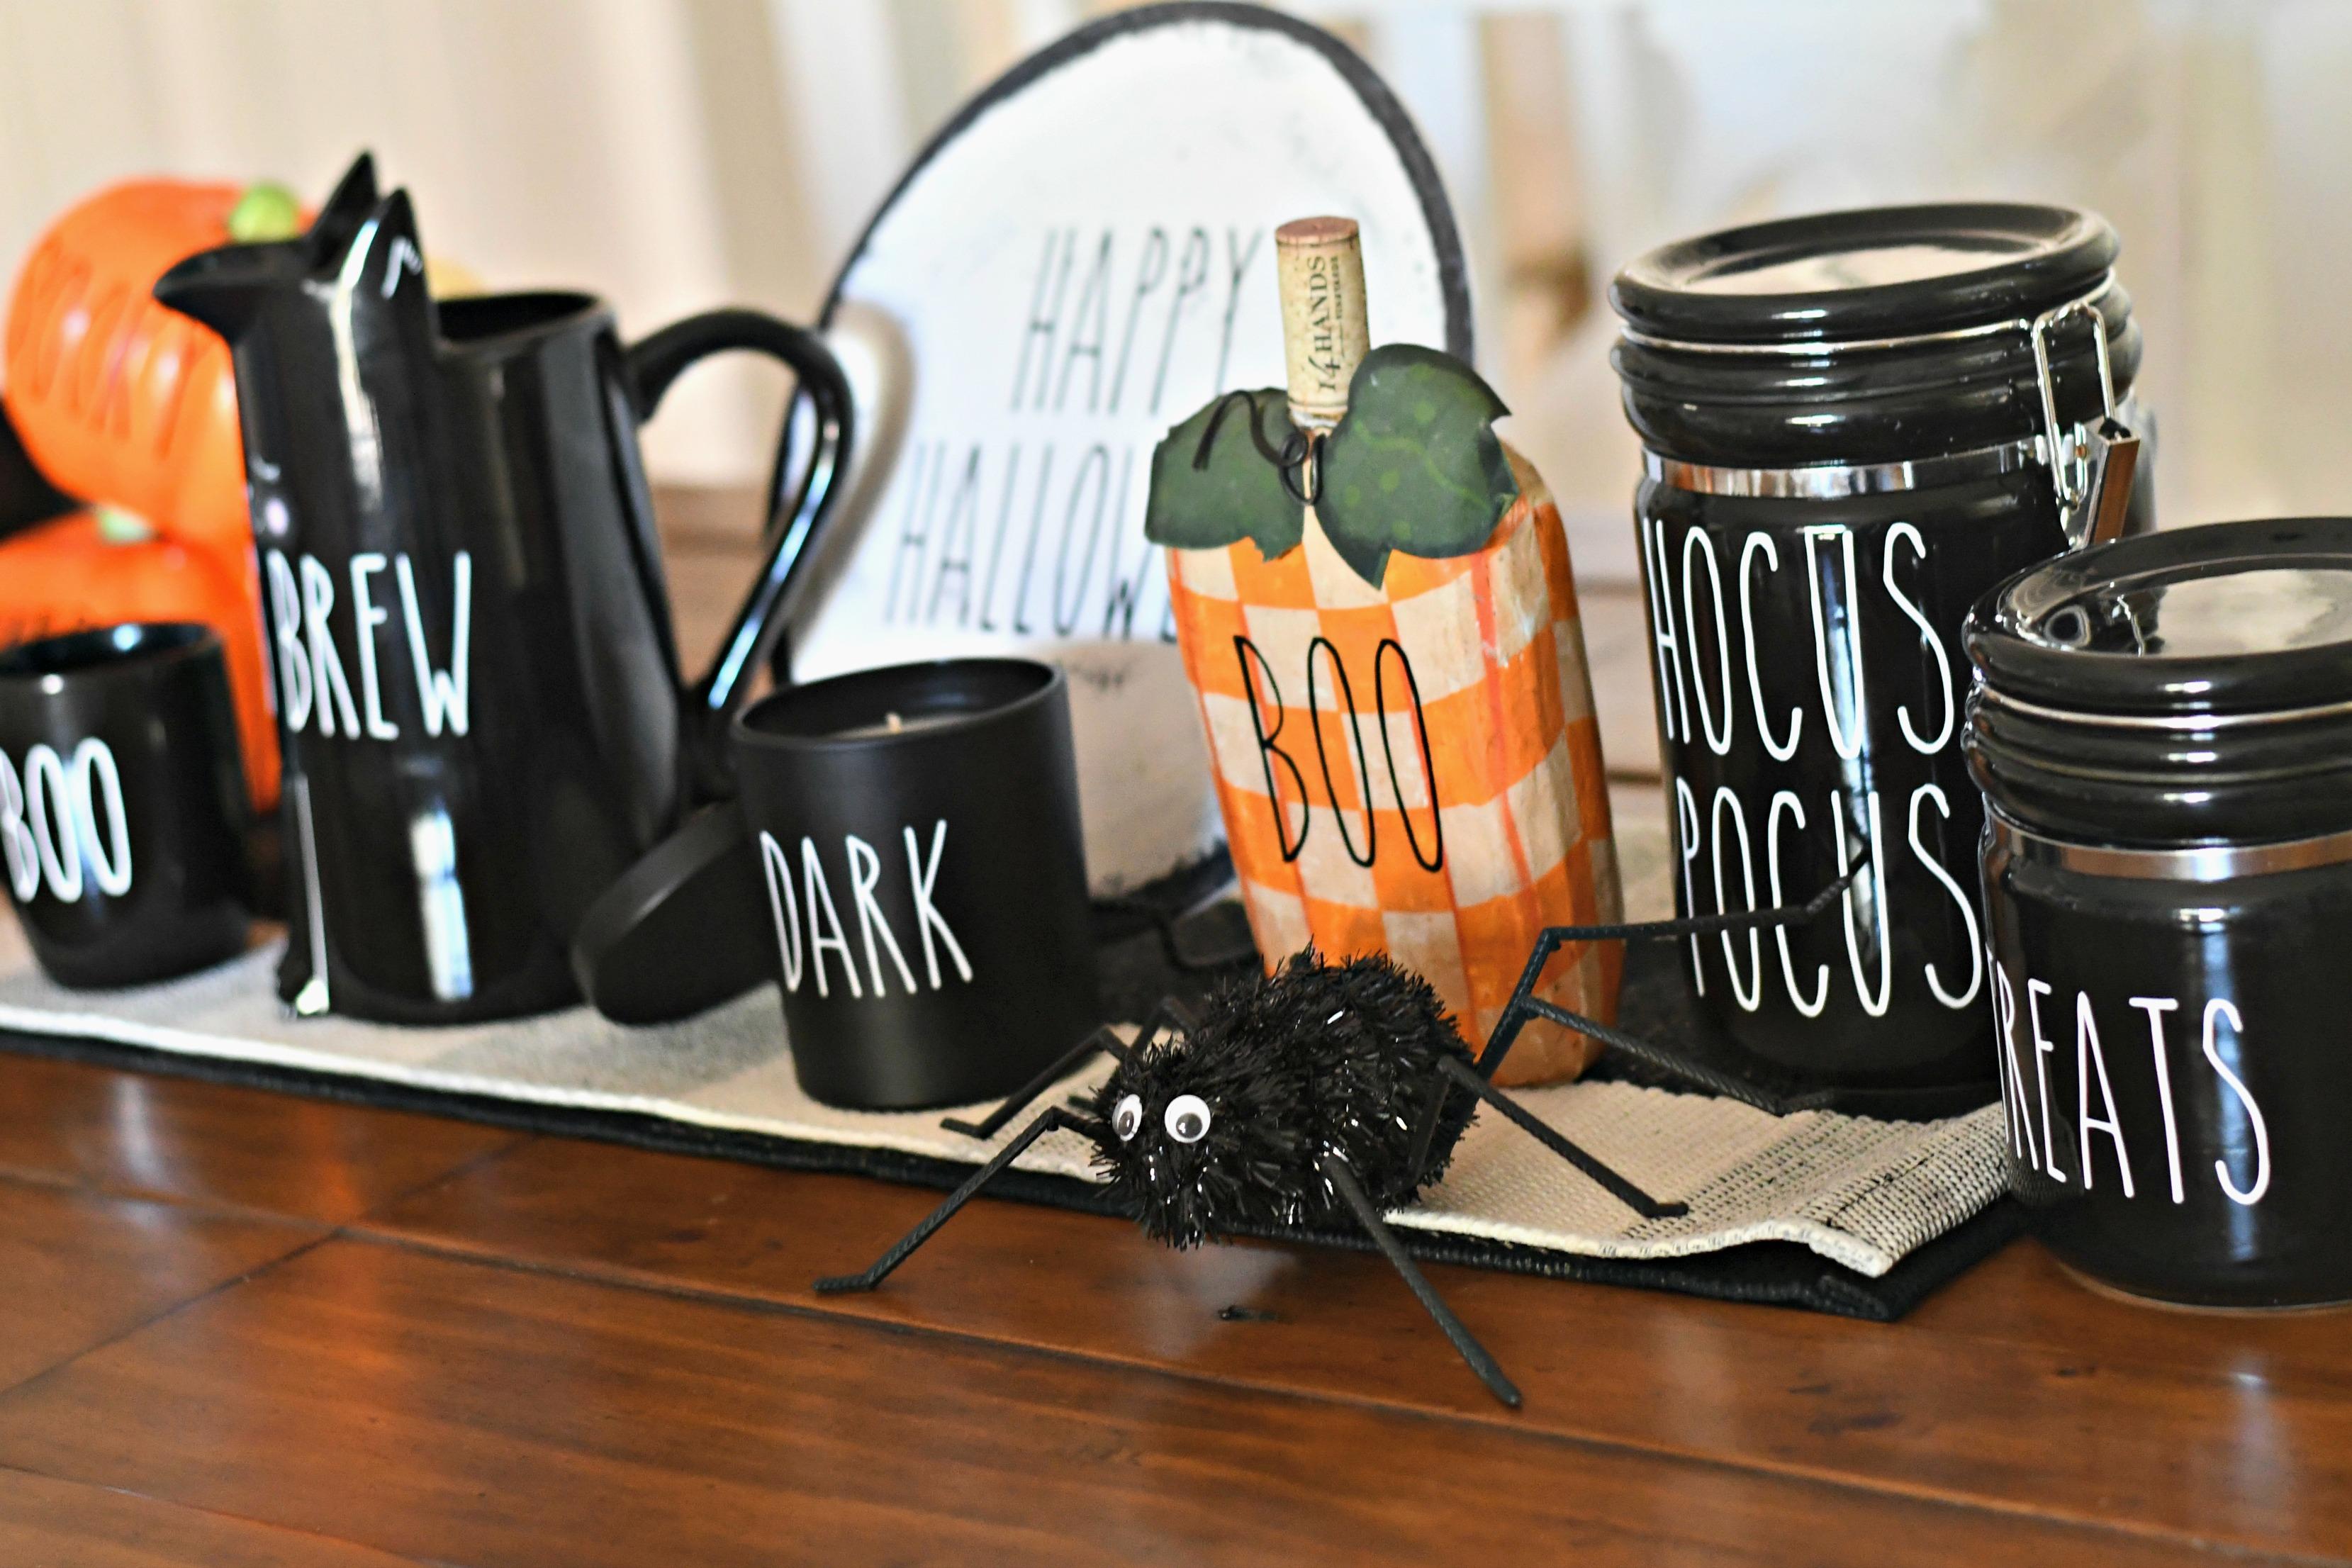 DIY Rae Dunn Inspired Halloween Decor - decorating a table runner